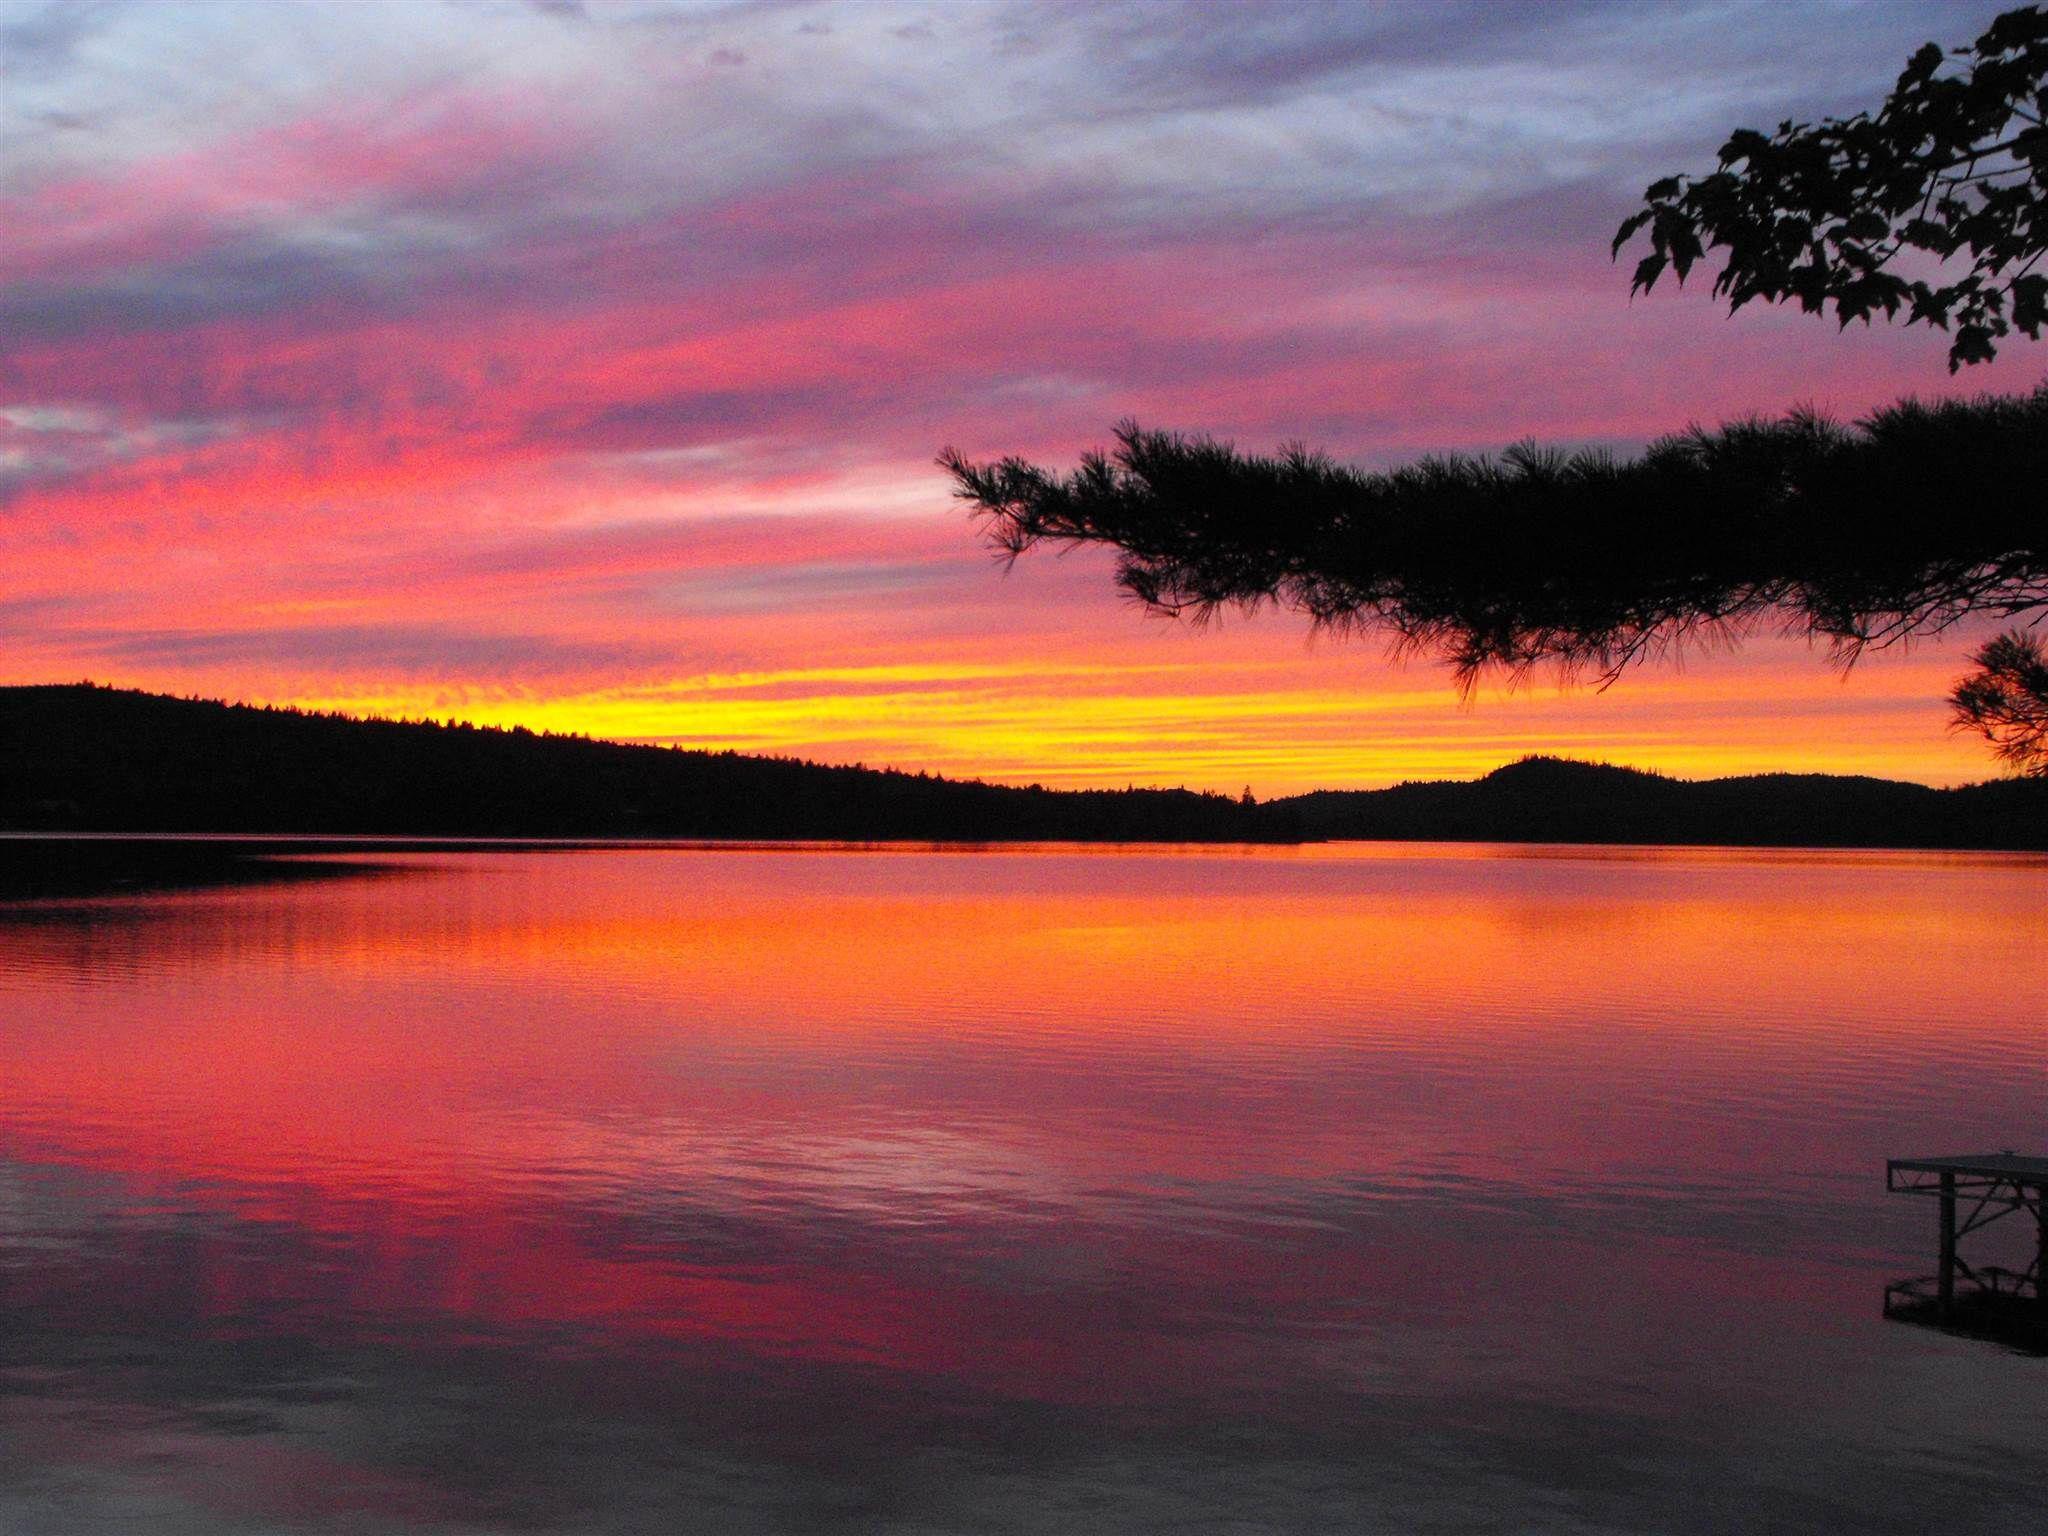 Main Photo: 36 Alexander Lane in Gaetz Brook: 31-Lawrencetown, Lake Echo, Porters Lake Residential for sale (Halifax-Dartmouth)  : MLS®# 202116396